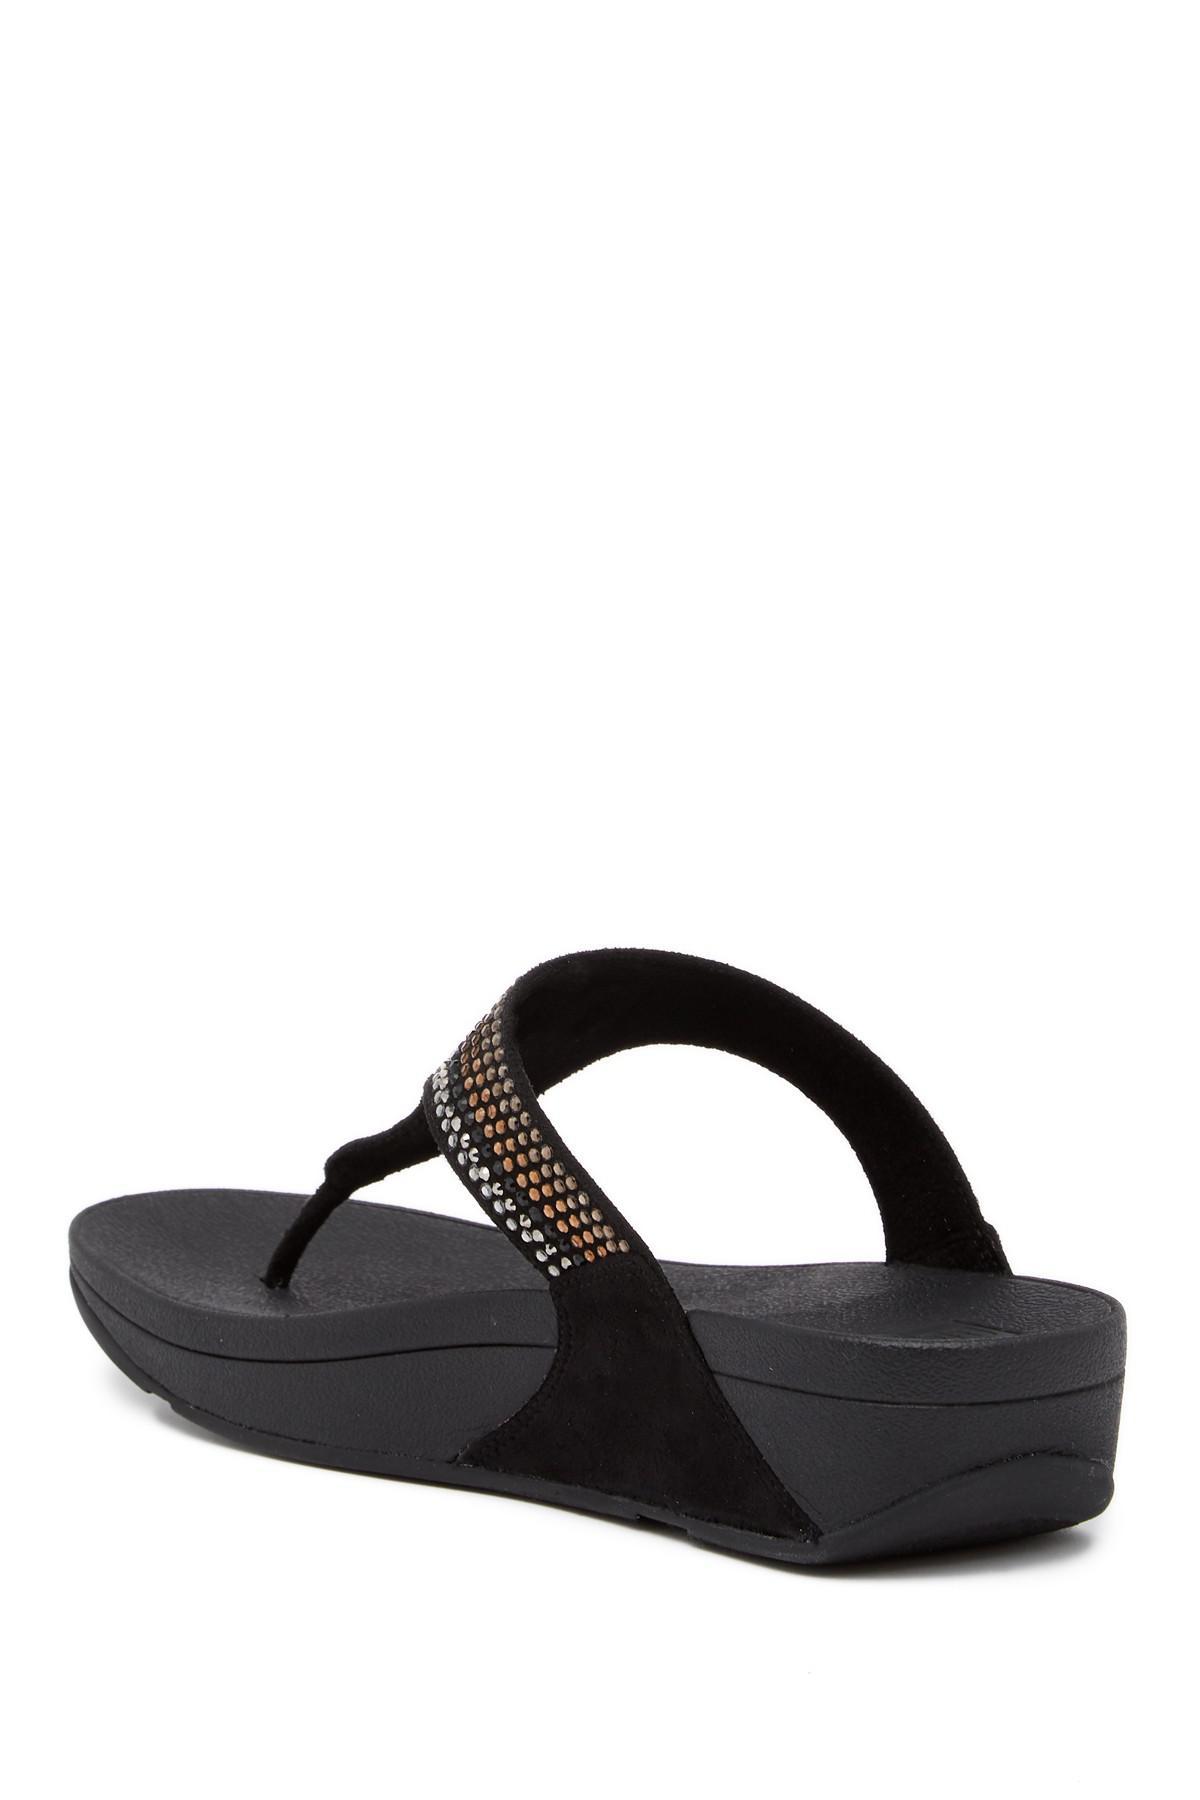 Fitflop Strobe Luxe Embellished Wedge Thong Sandal vVZj7MGT